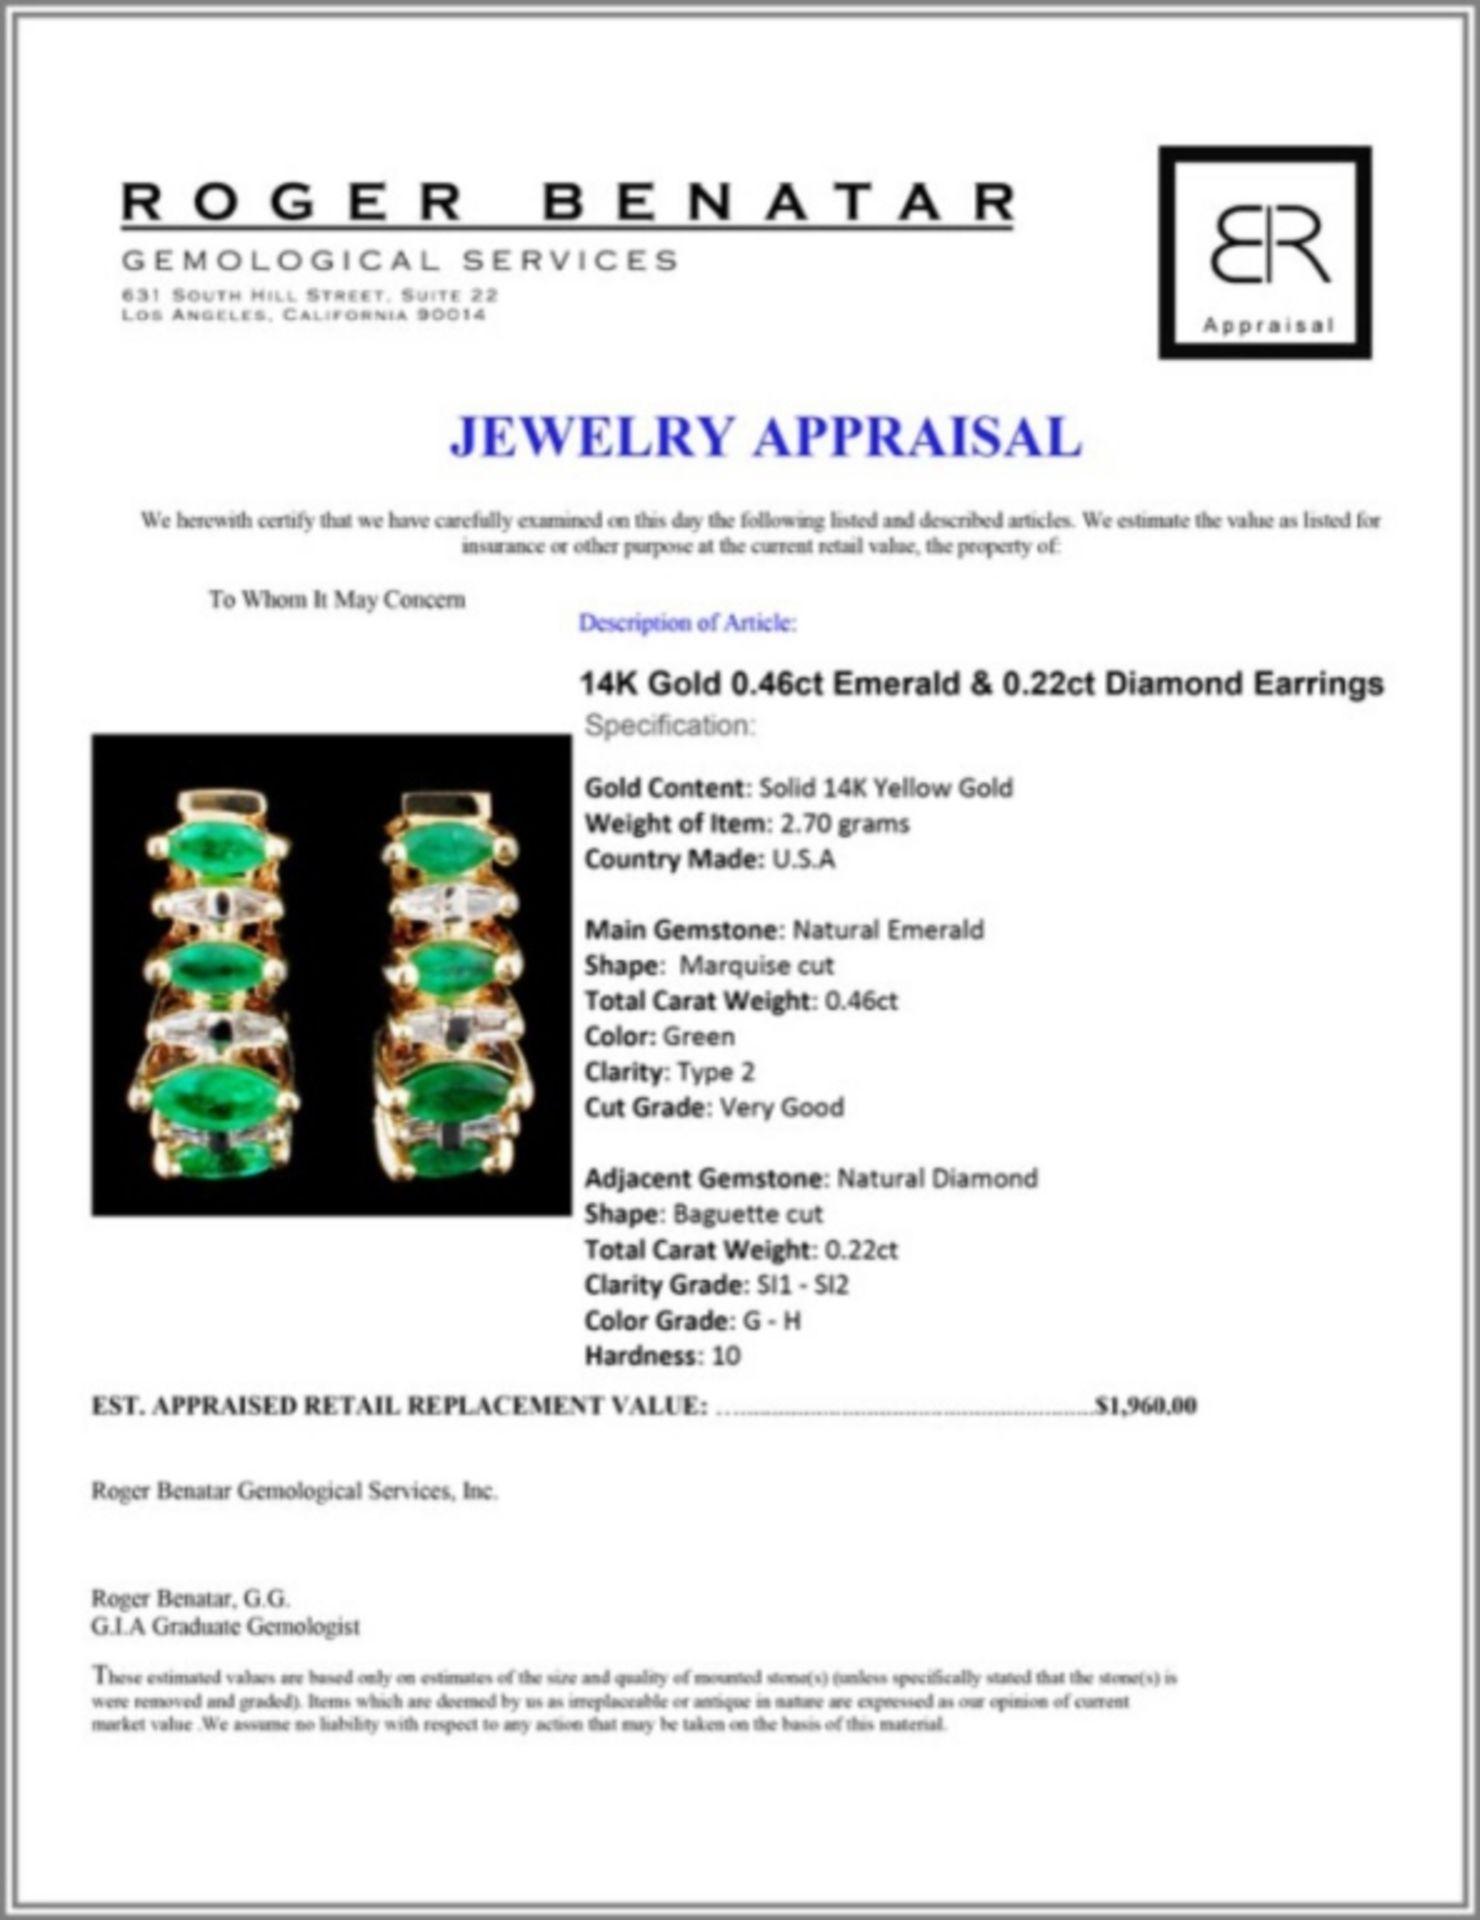 14K Gold 0.46ct Emerald & 0.22ct Diamond Earrings - Image 3 of 3